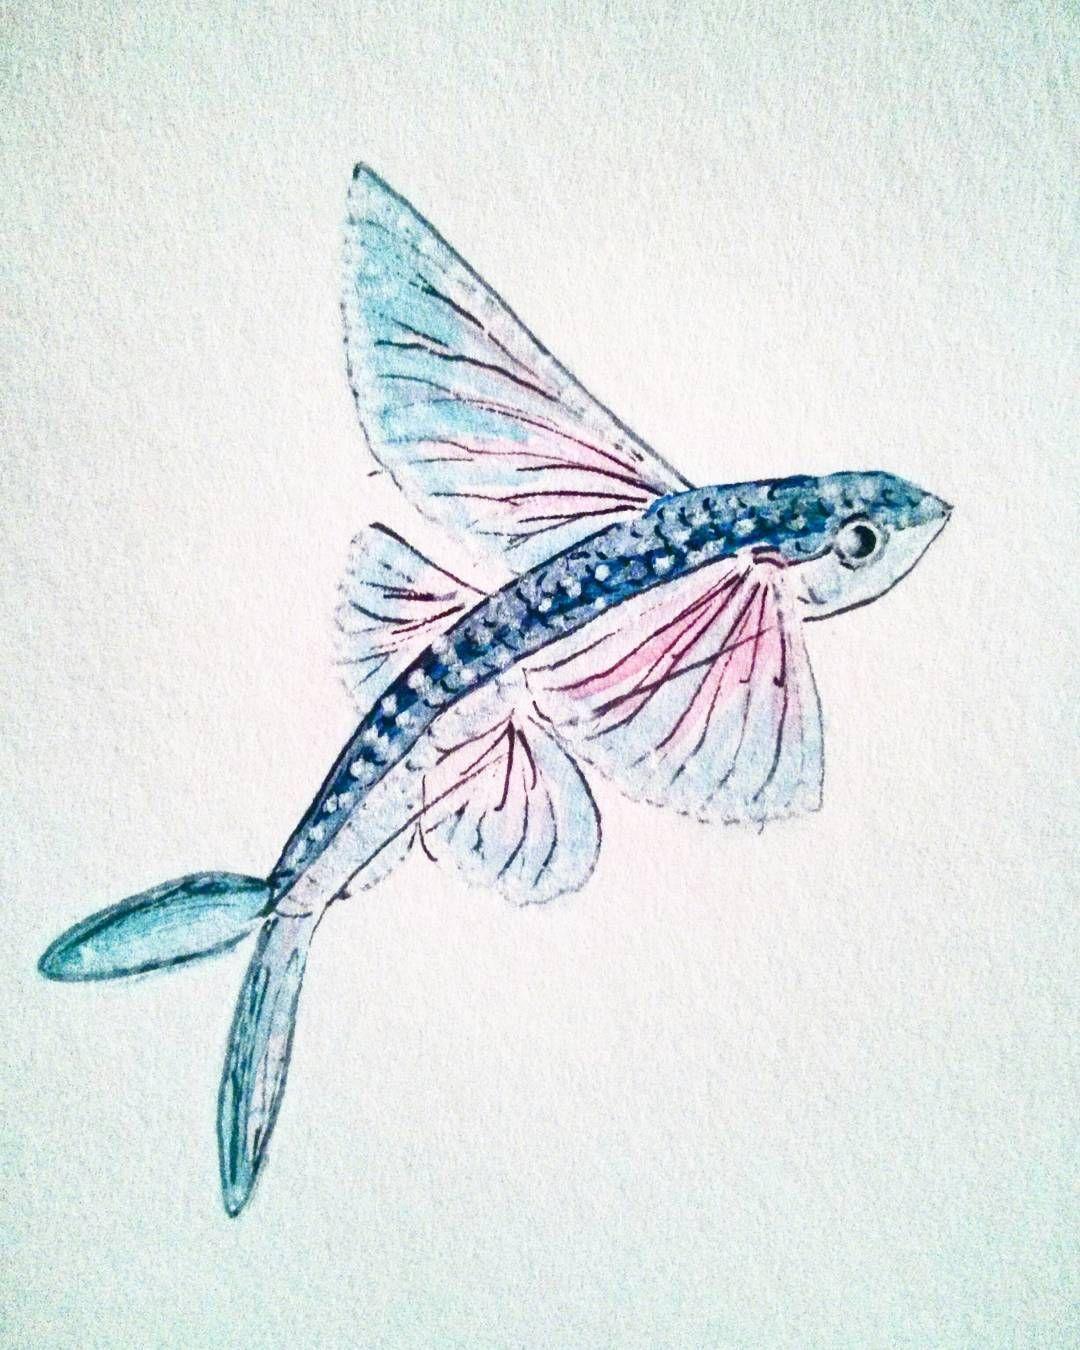 Flying Fish Flyingfish Watercolor Drawing Art Blue Pink Fish Sketch Fish Drawings Watercolor Fish